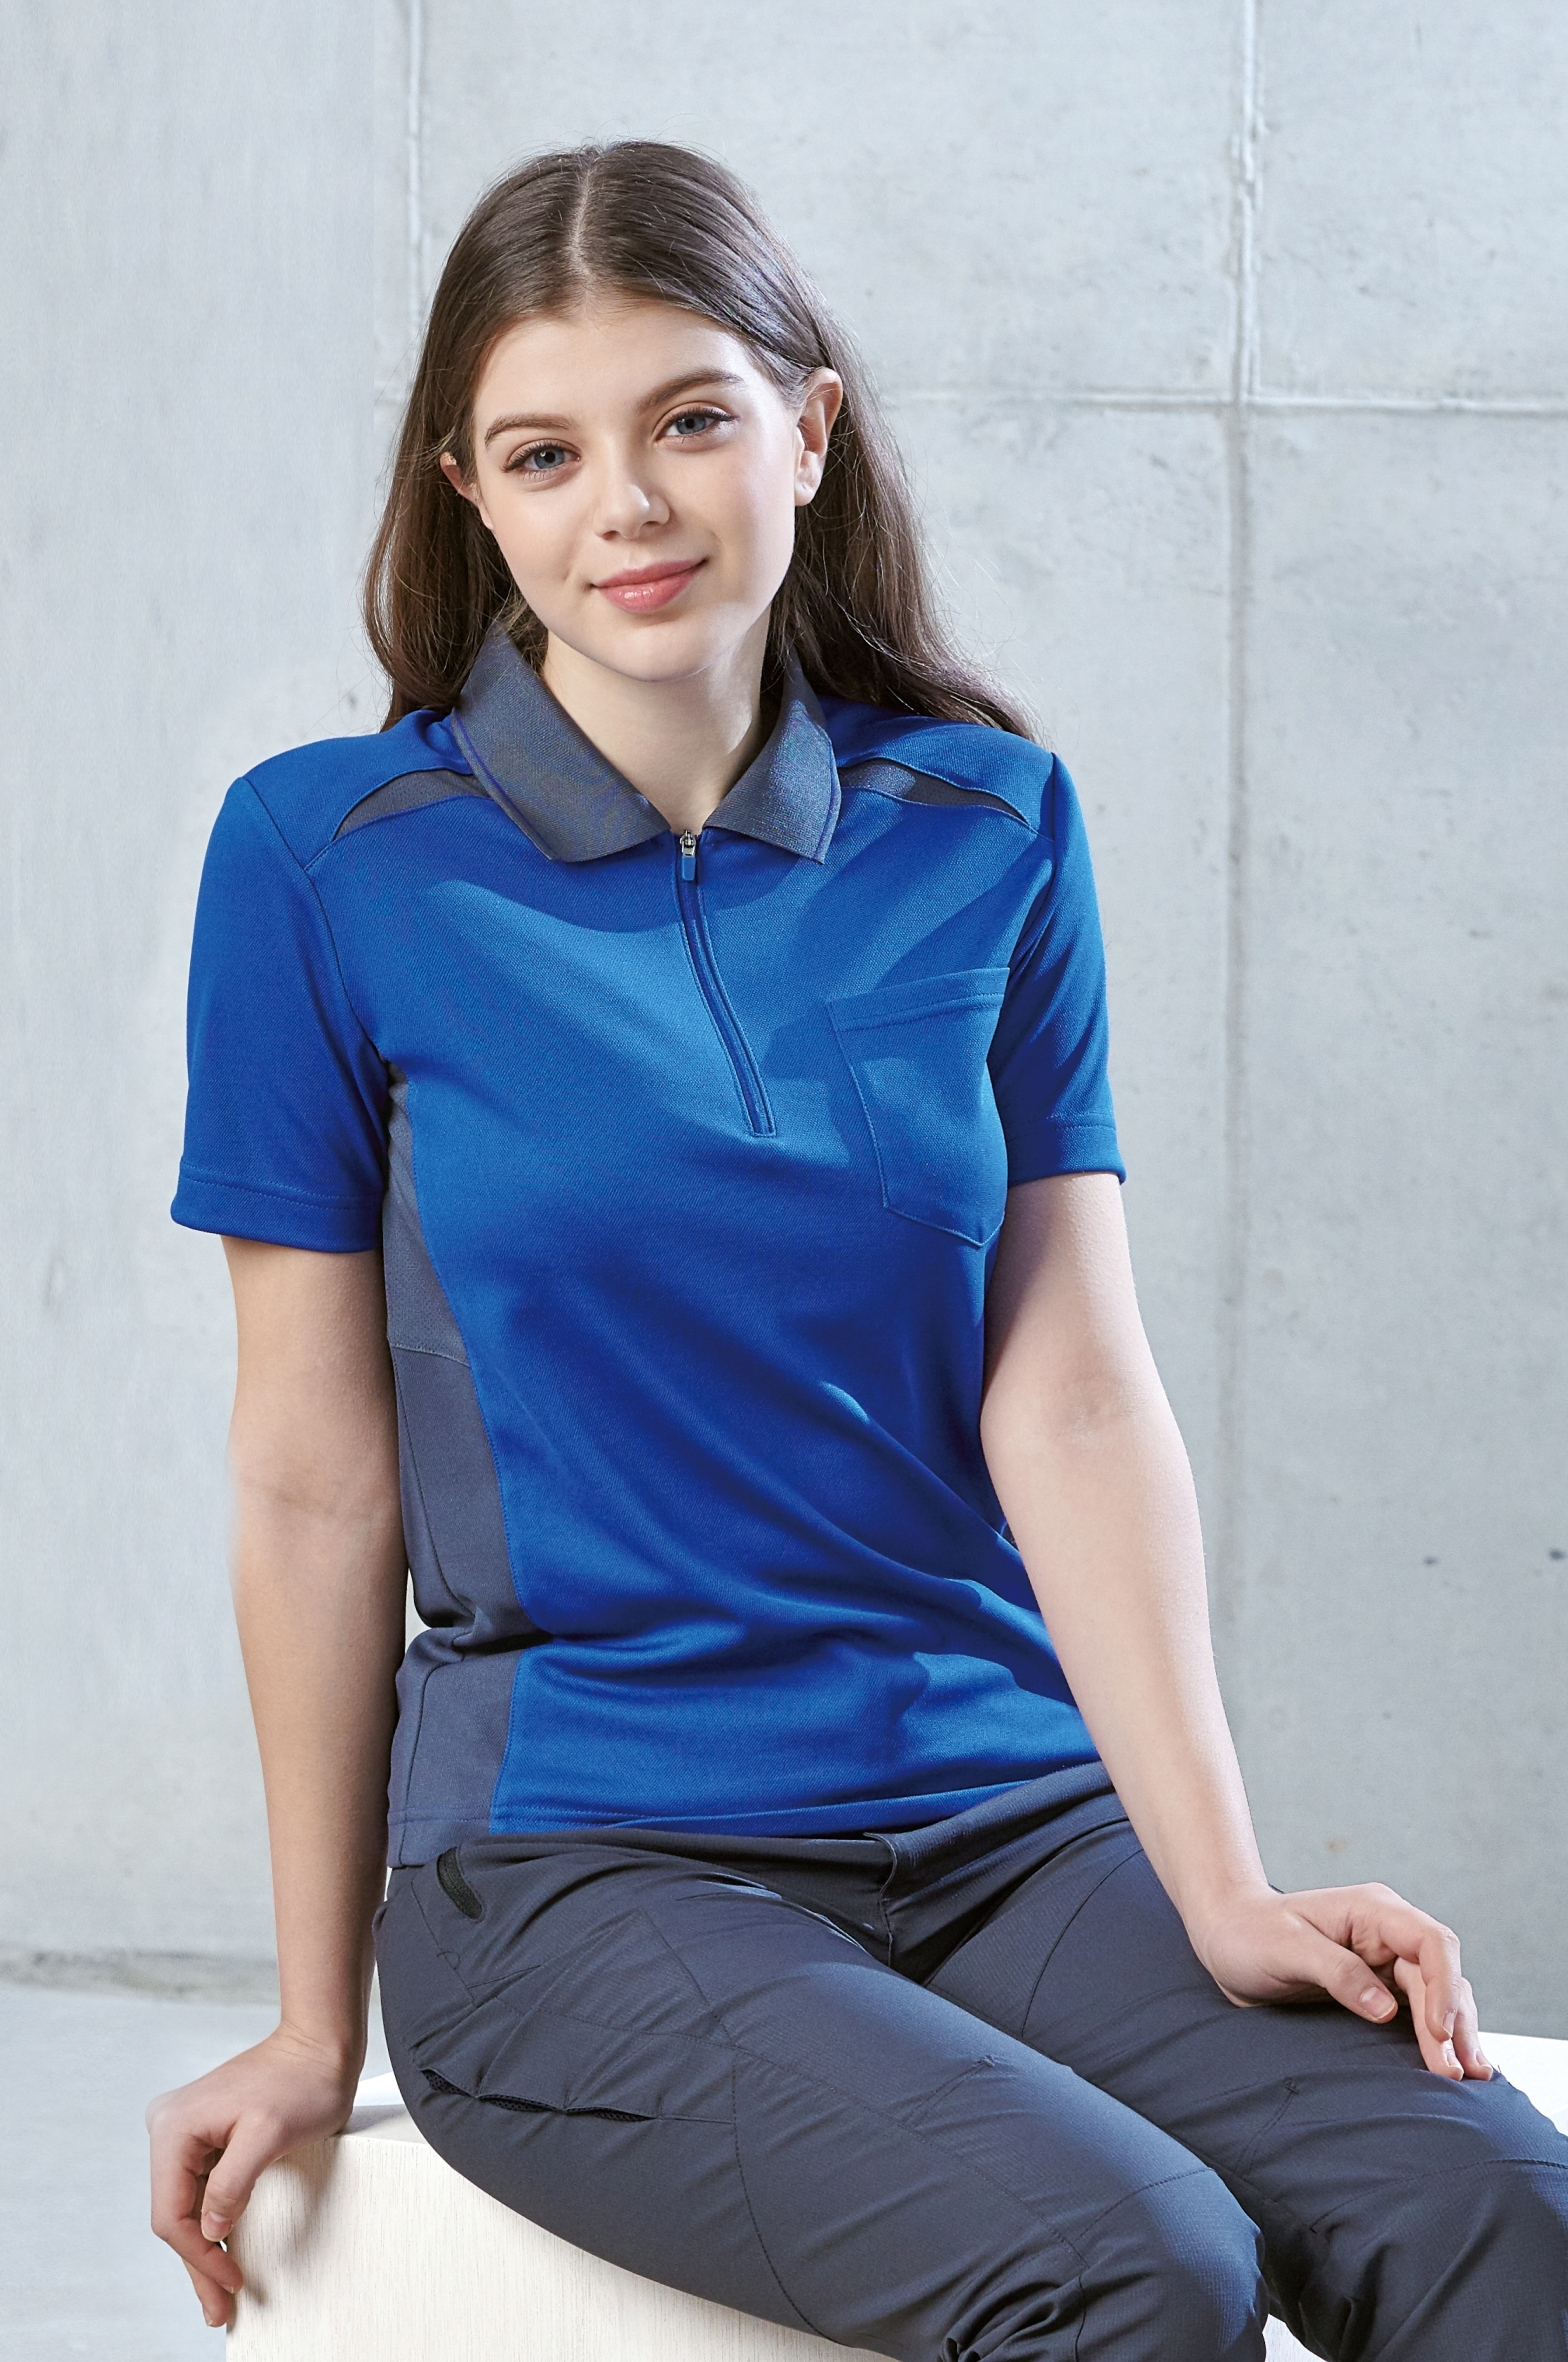 ZB-T2036 (블루.쿨론)지벤 춘하 작업복 티셔츠